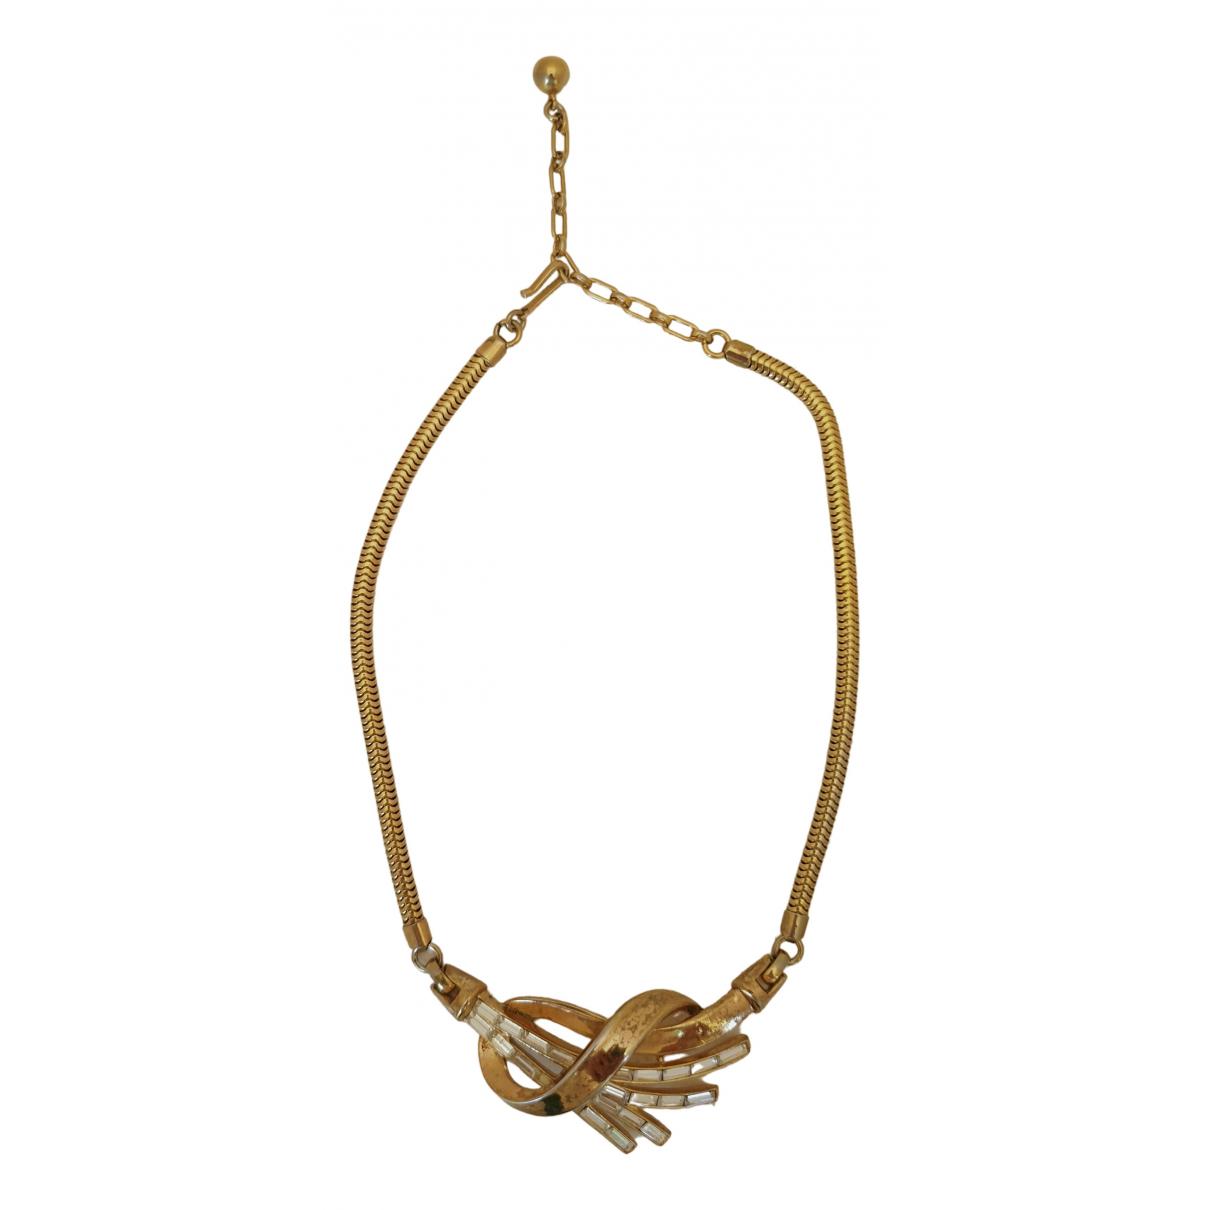 Trifari \N Gold Metal necklace for Women \N